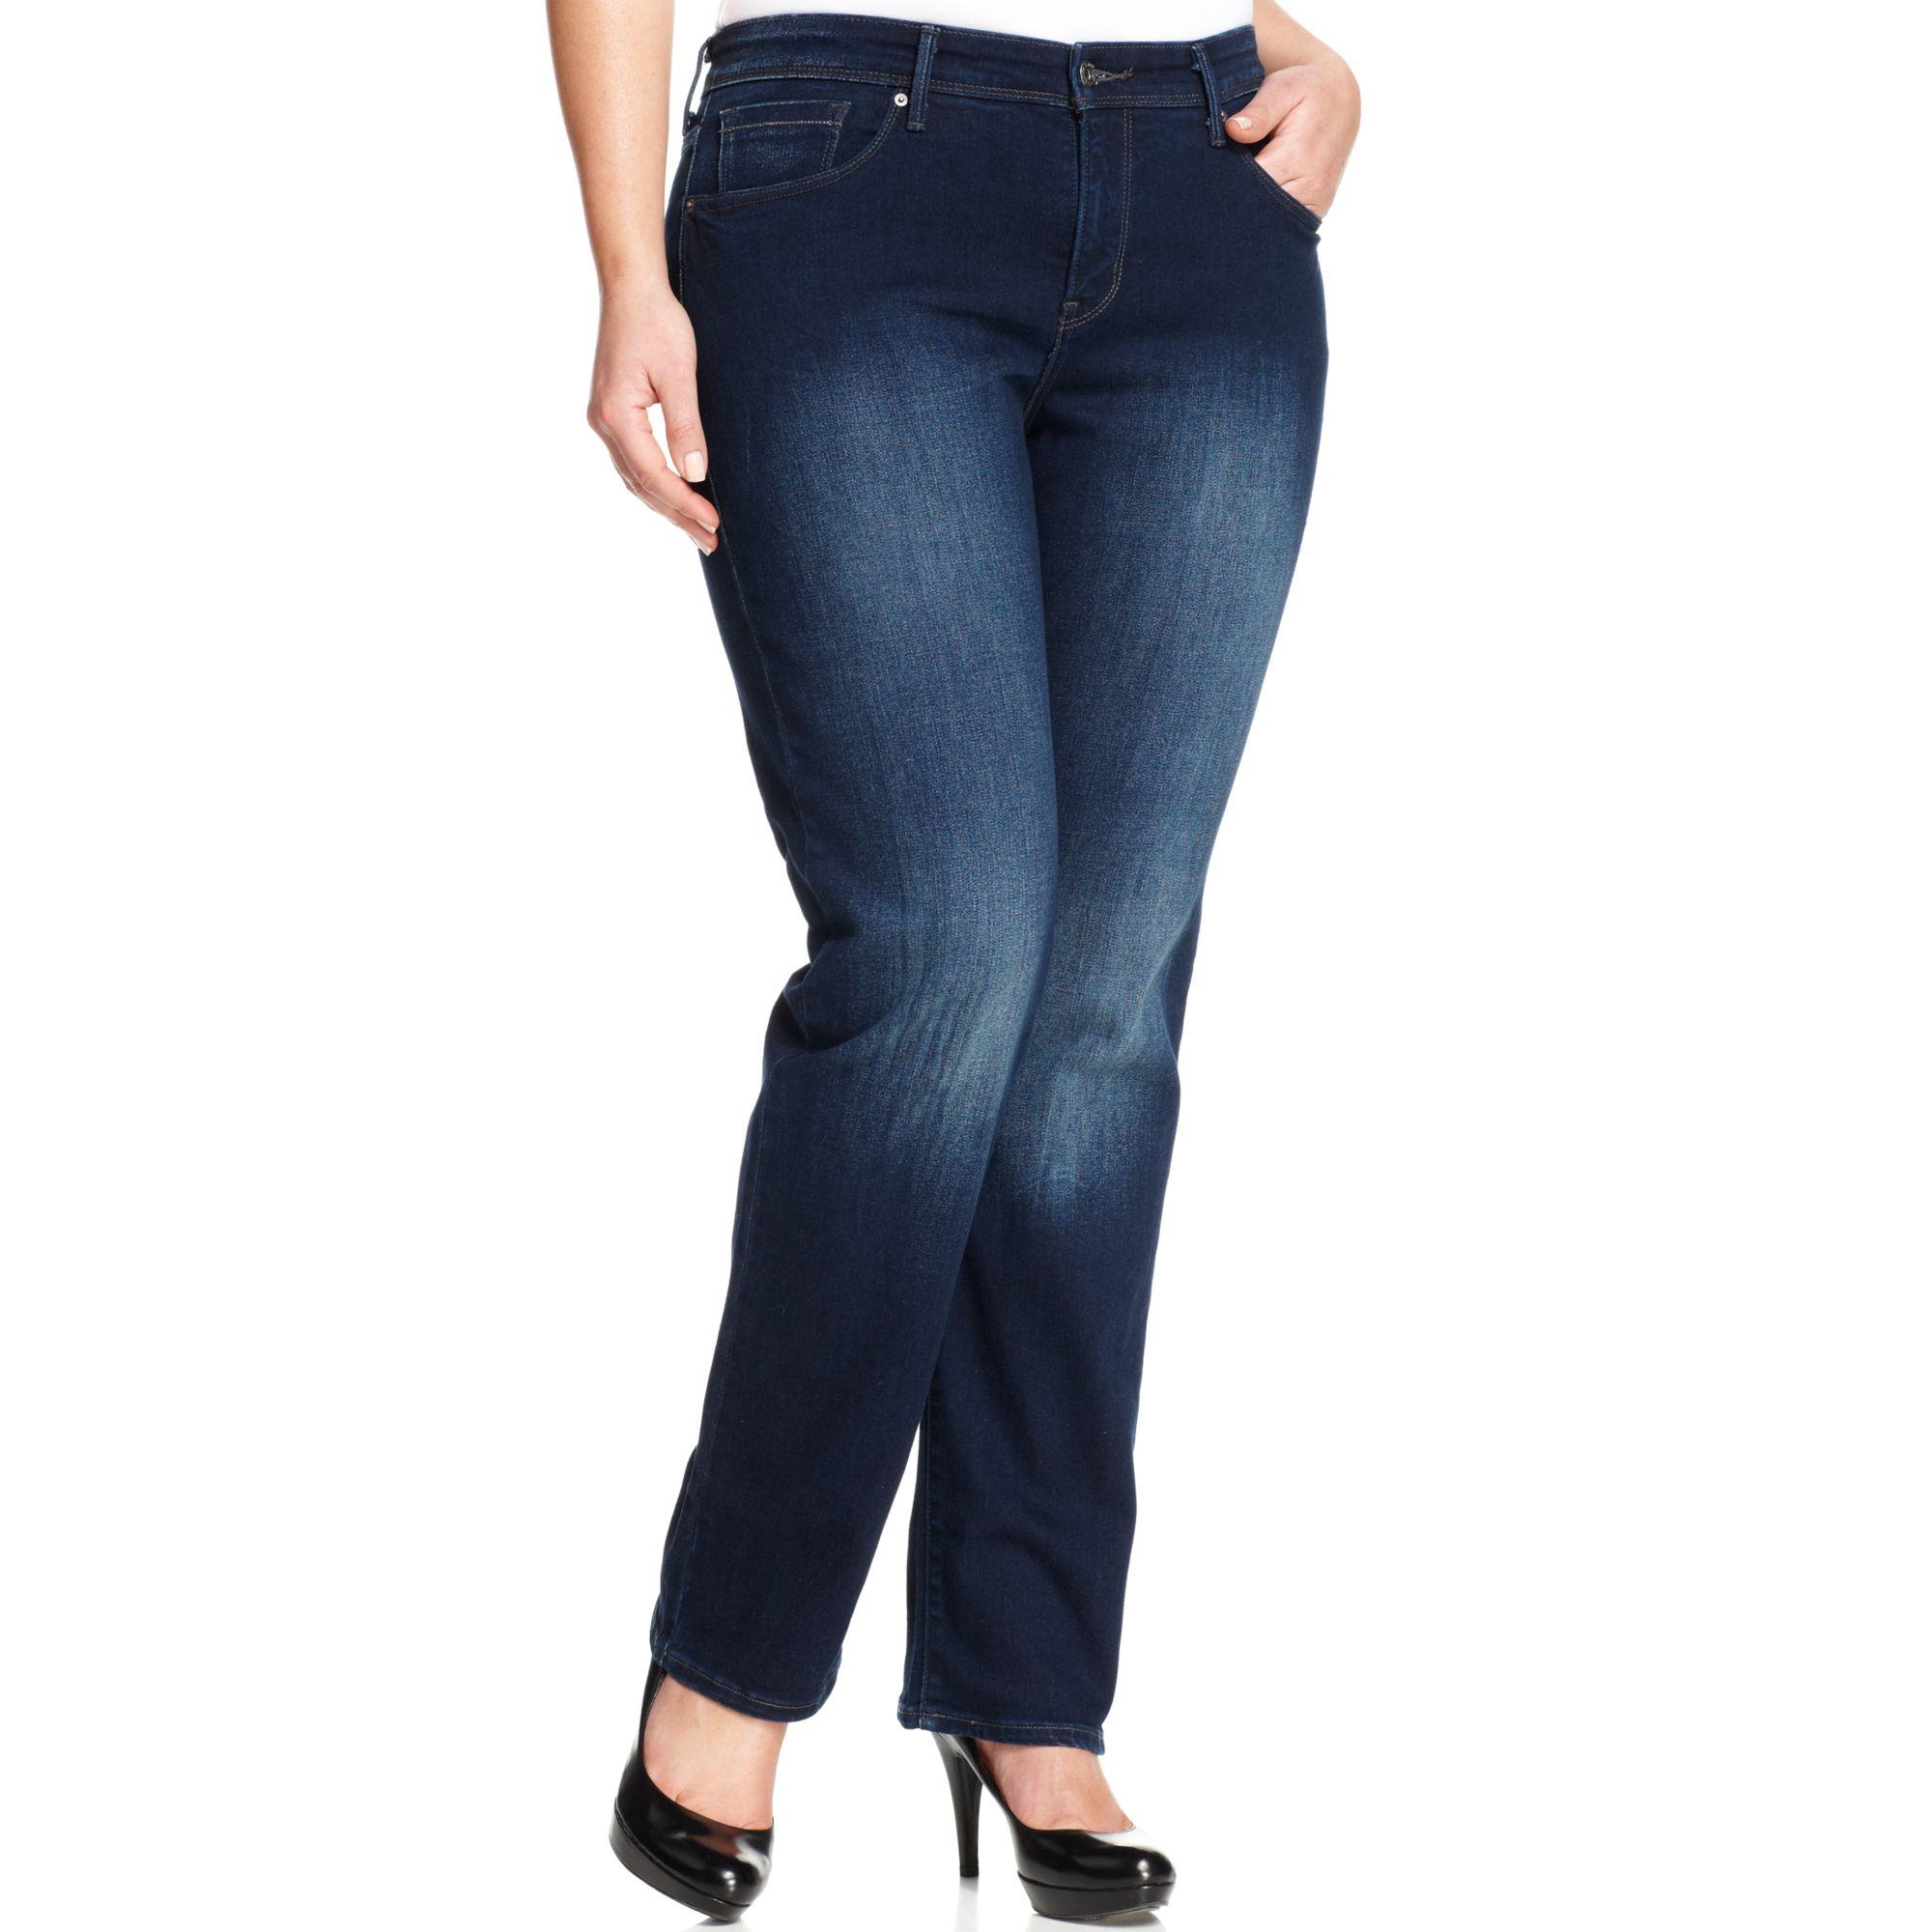 levi 39 s levi plus size 512 perfectly shaping straightleg jeans hidden dark sea wash in blue. Black Bedroom Furniture Sets. Home Design Ideas